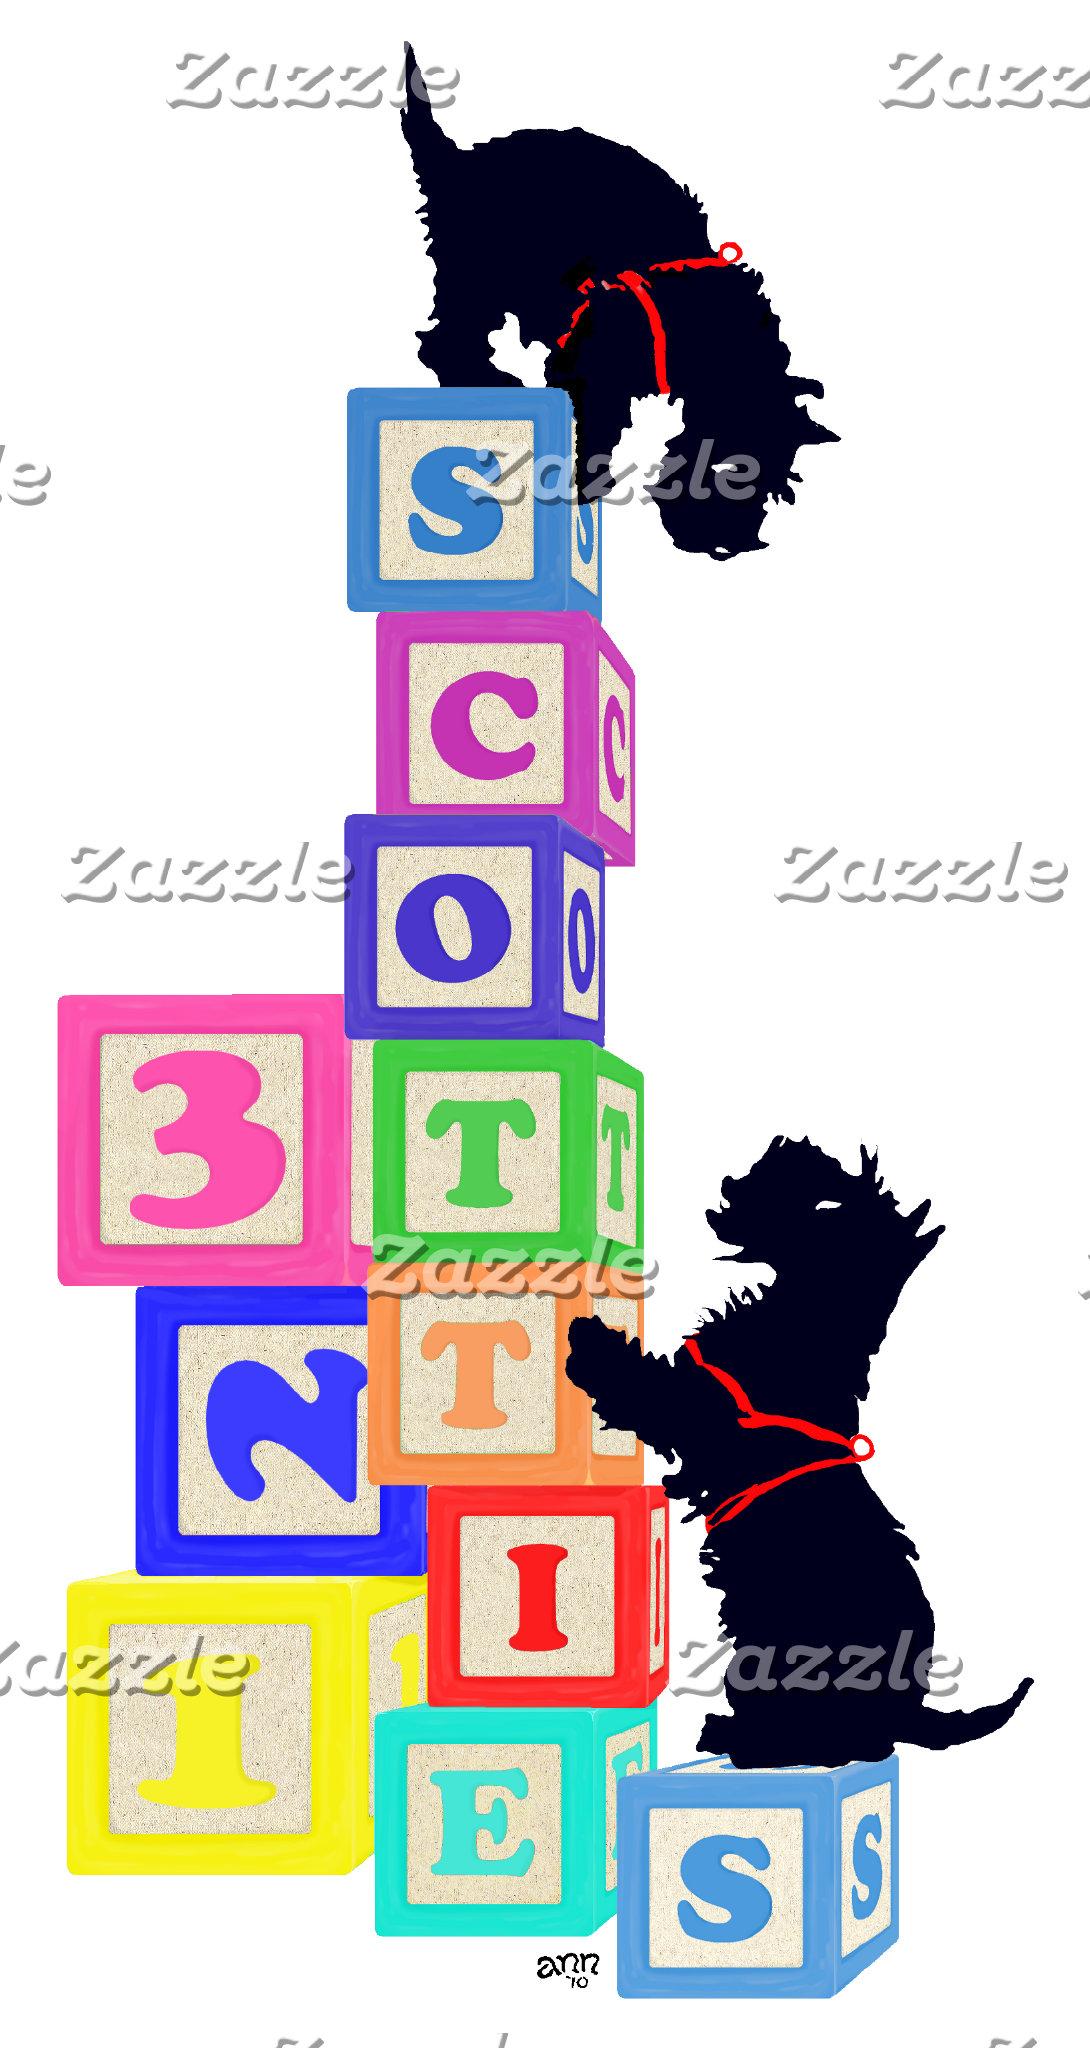 6 Scottie Blocks